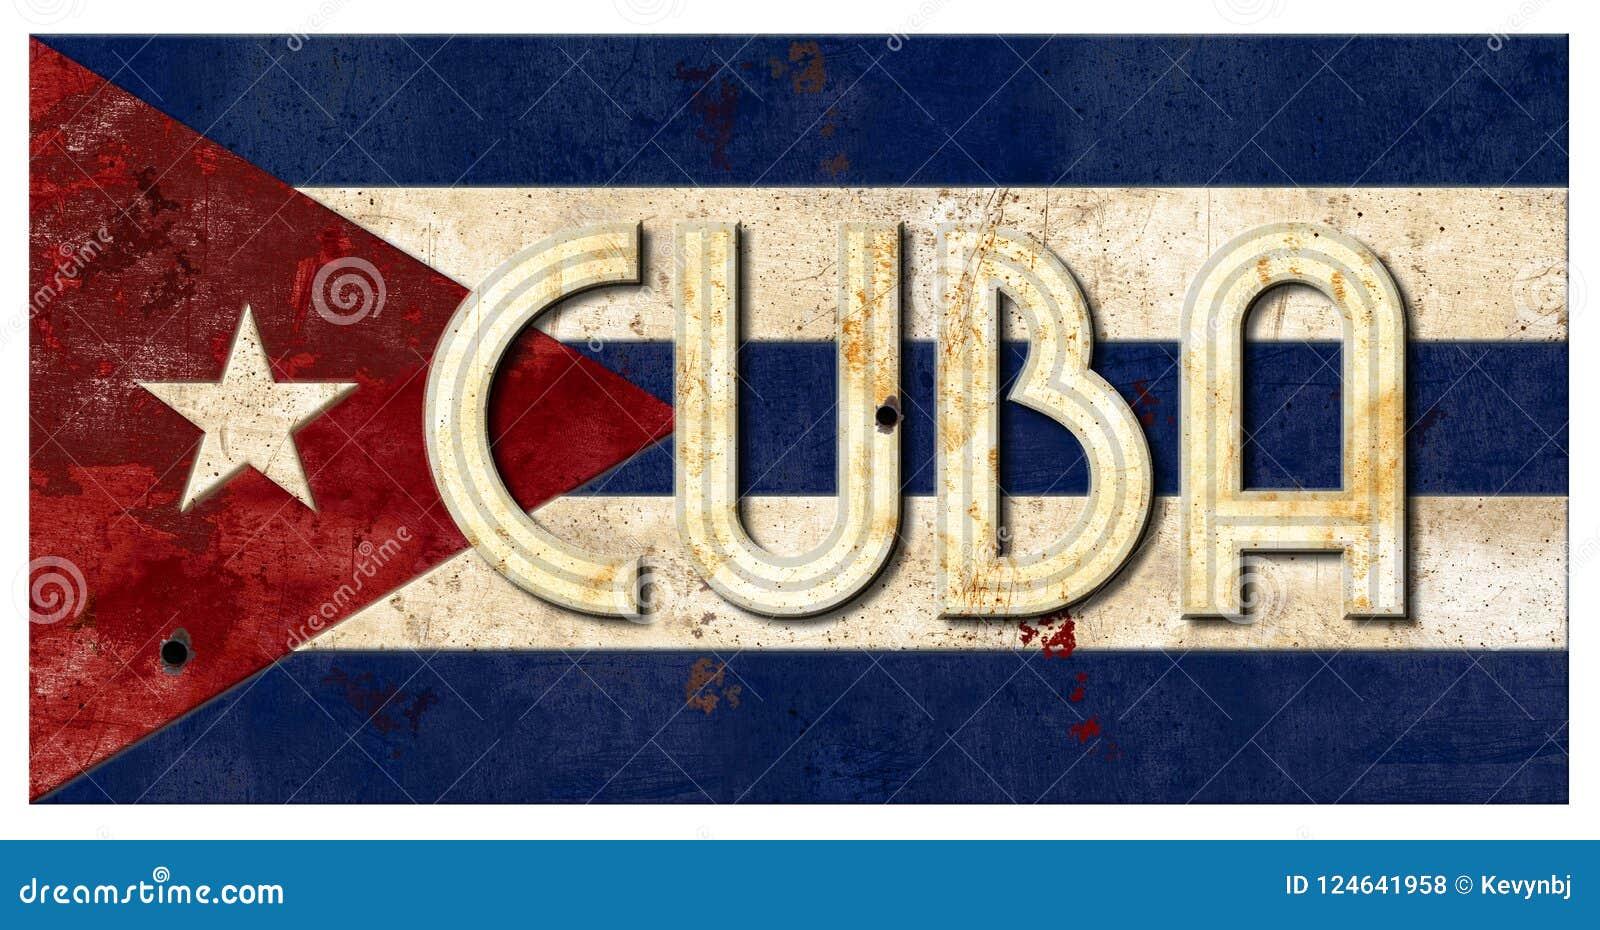 Cuban Flag Grunge Cuba Lettering Metal Old Rustic Vingage